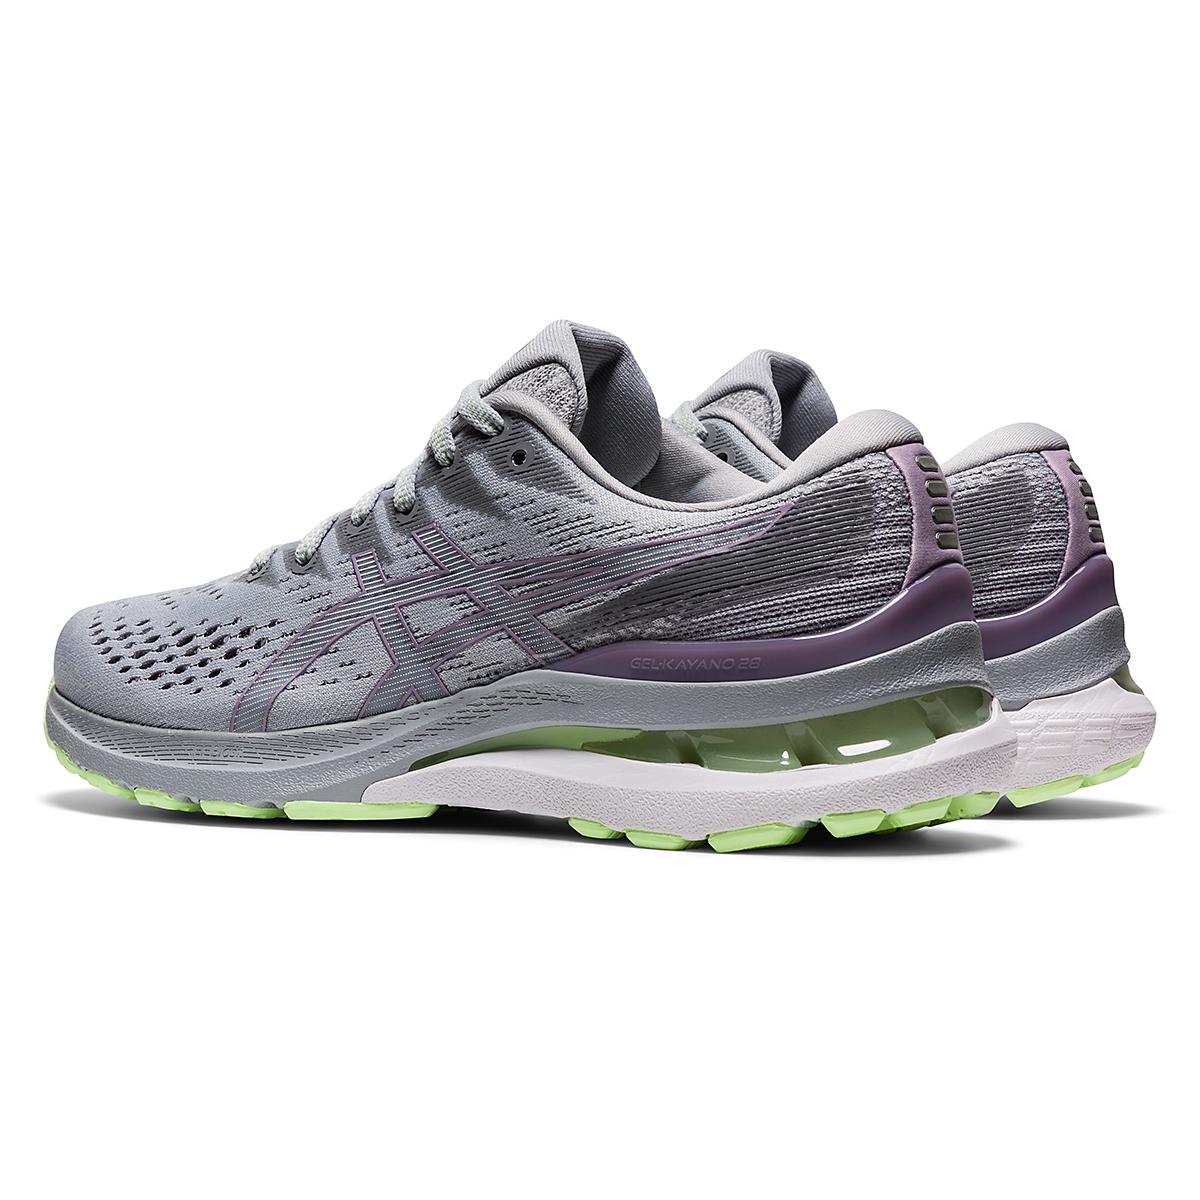 Women's Asics Gel-Kayano 28 Running Shoe - Color: Piedmont Grey/Lavender - Size: 5 - Width: Regular, Piedmont Grey/Lavender, large, image 4